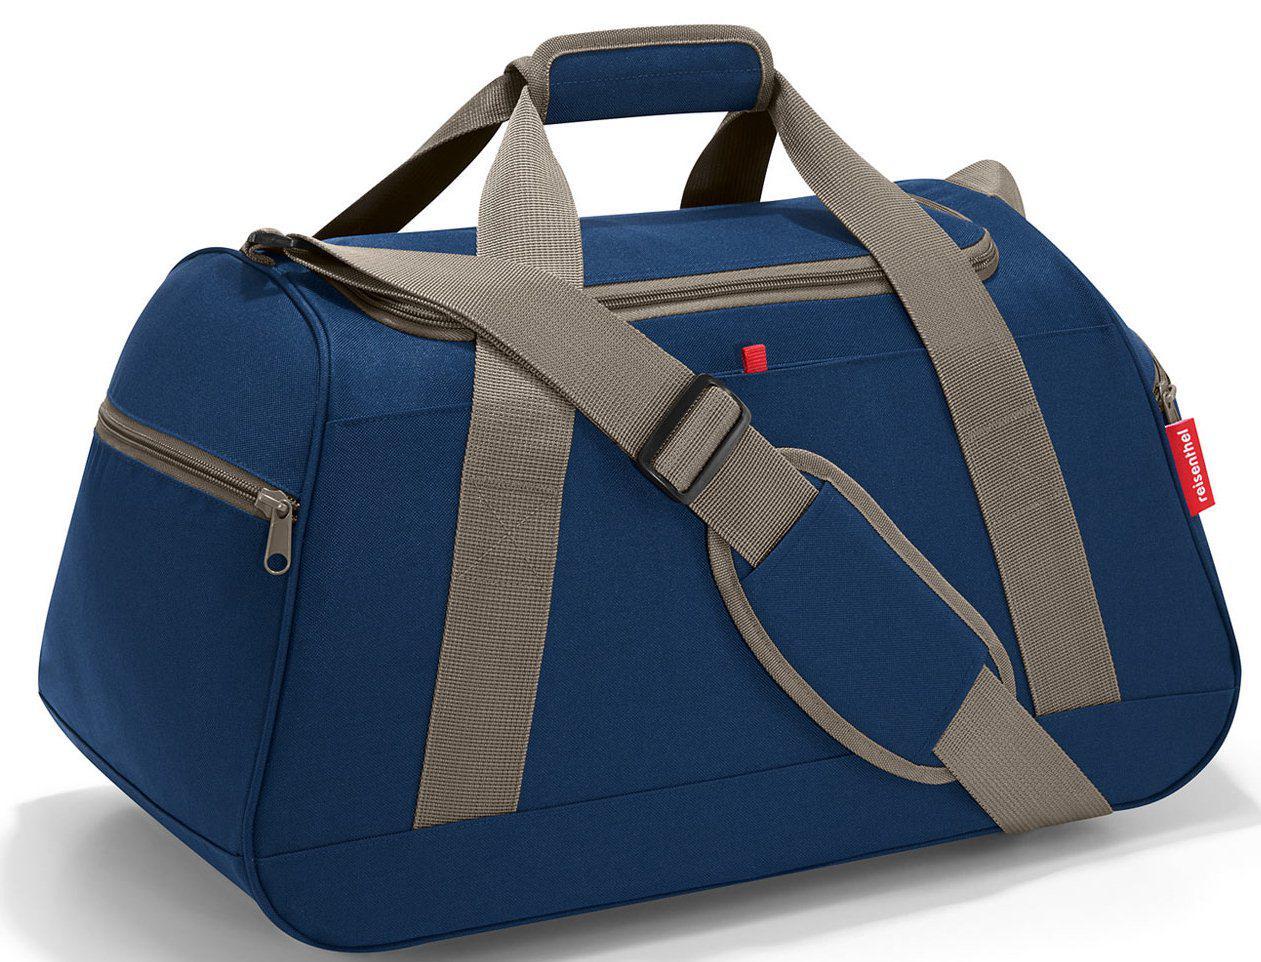 79717dfd3863 Мужская, дорожная сумка Reisenthel, MX4059, 35 л., текстиль, синий ...